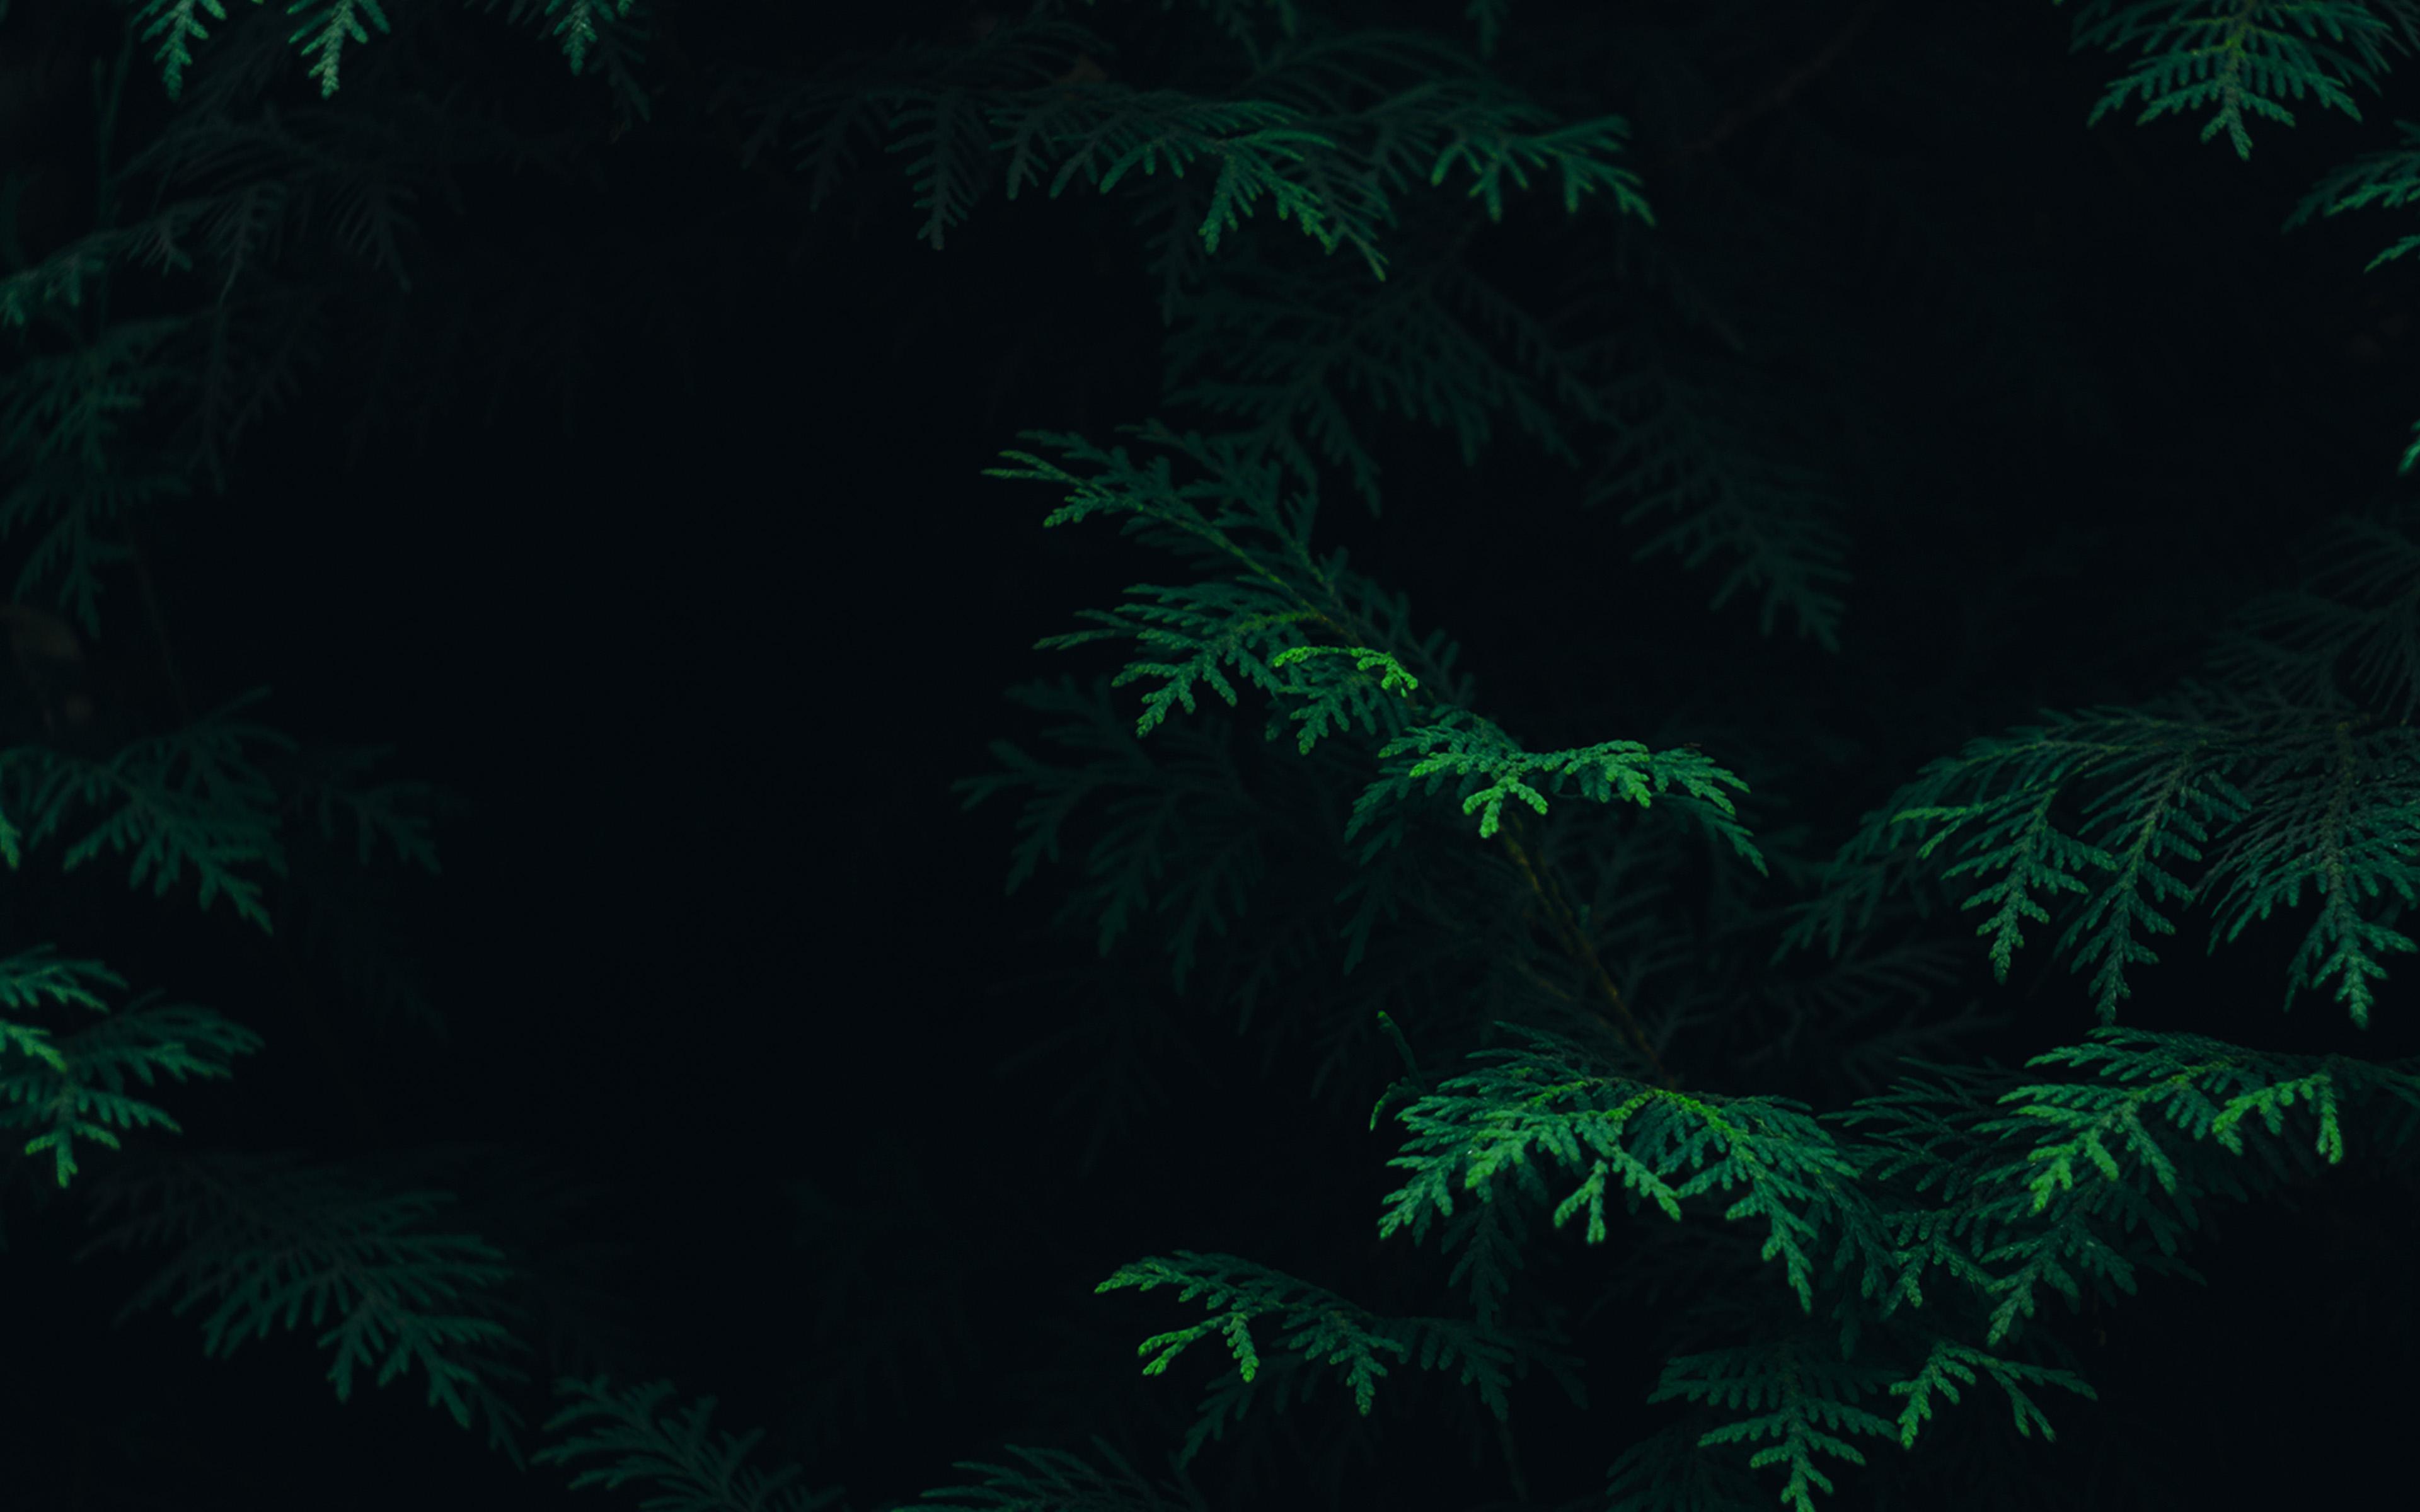 Dark 4k Nature Wallpaper